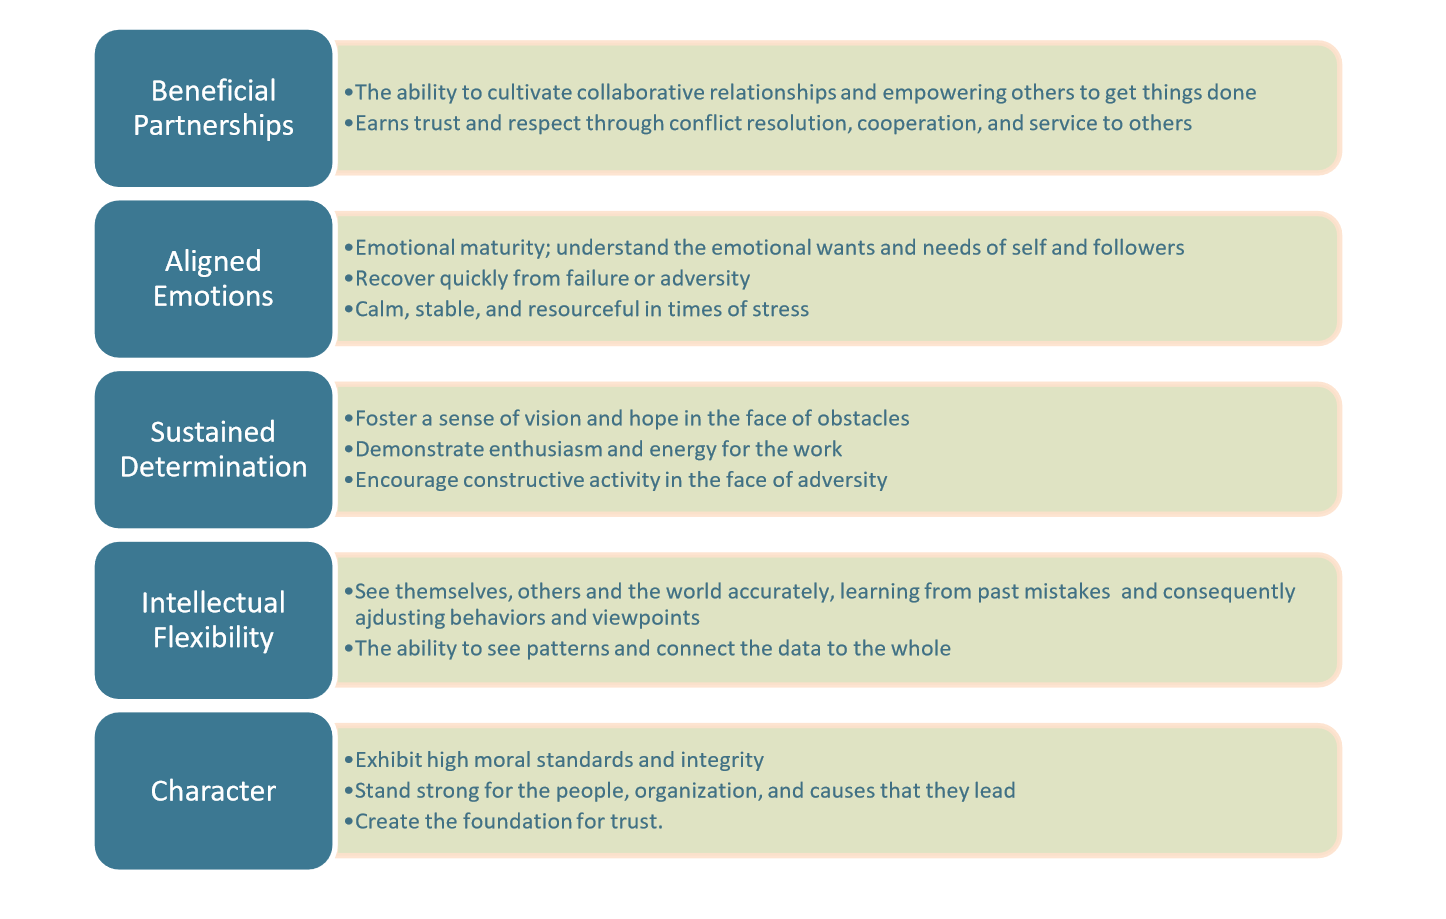 4R Model of Transformational Leadership